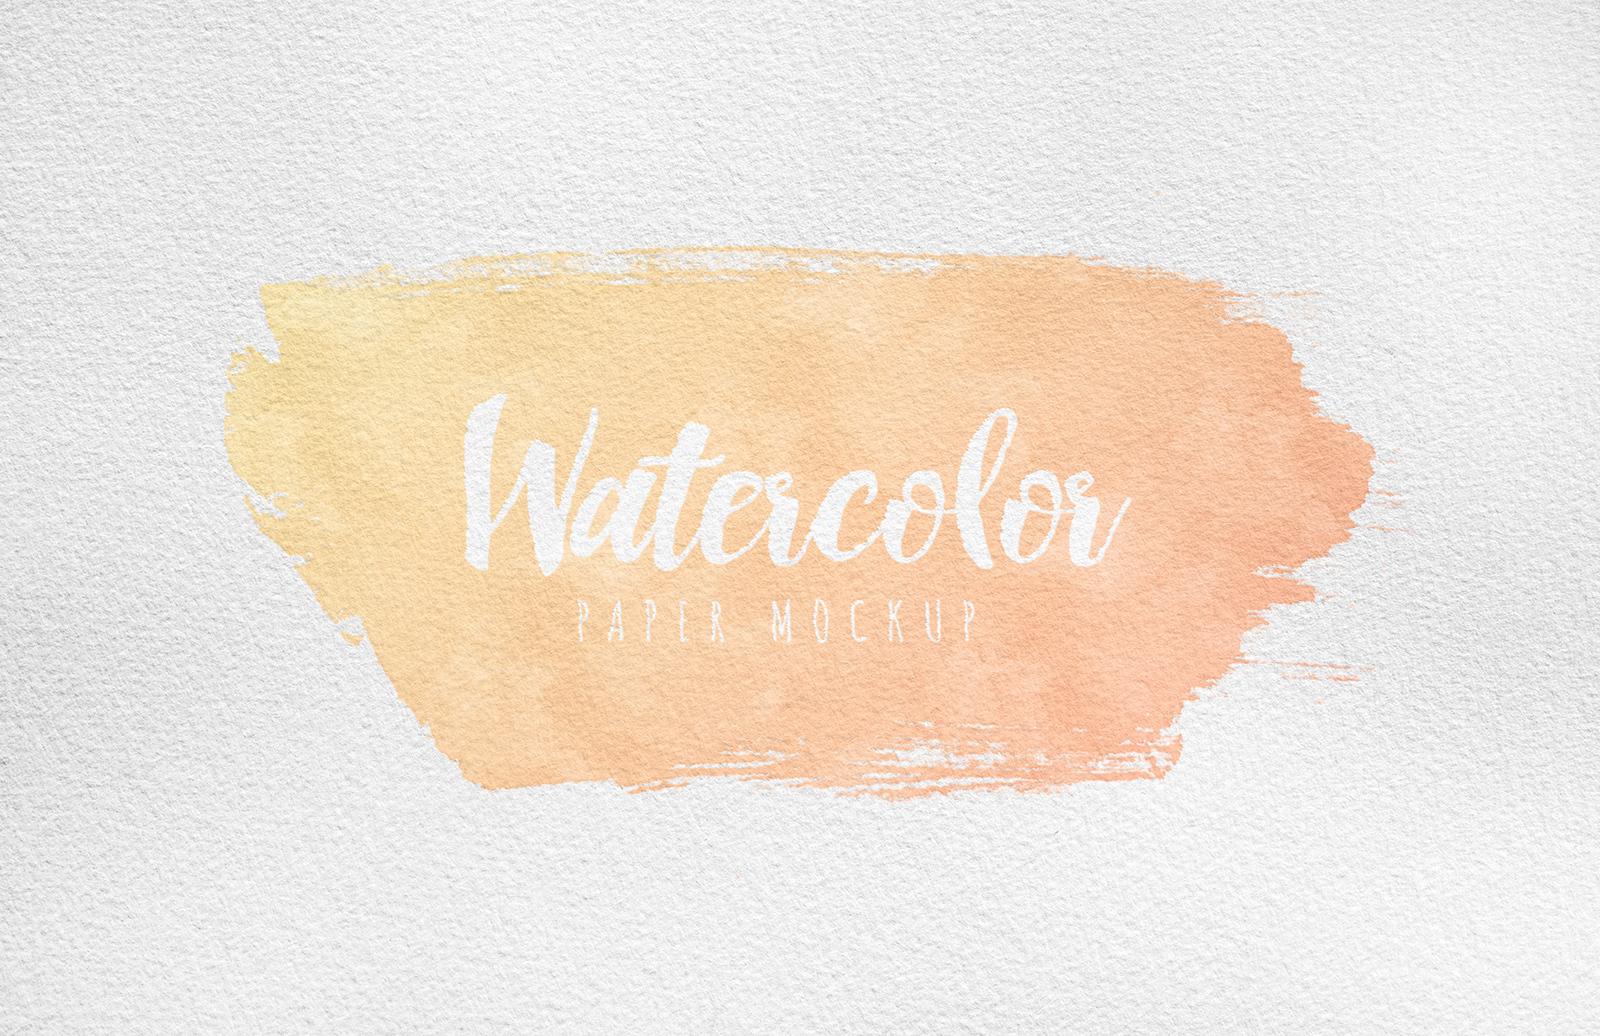 Watercolor Paper Mockup Preview 5